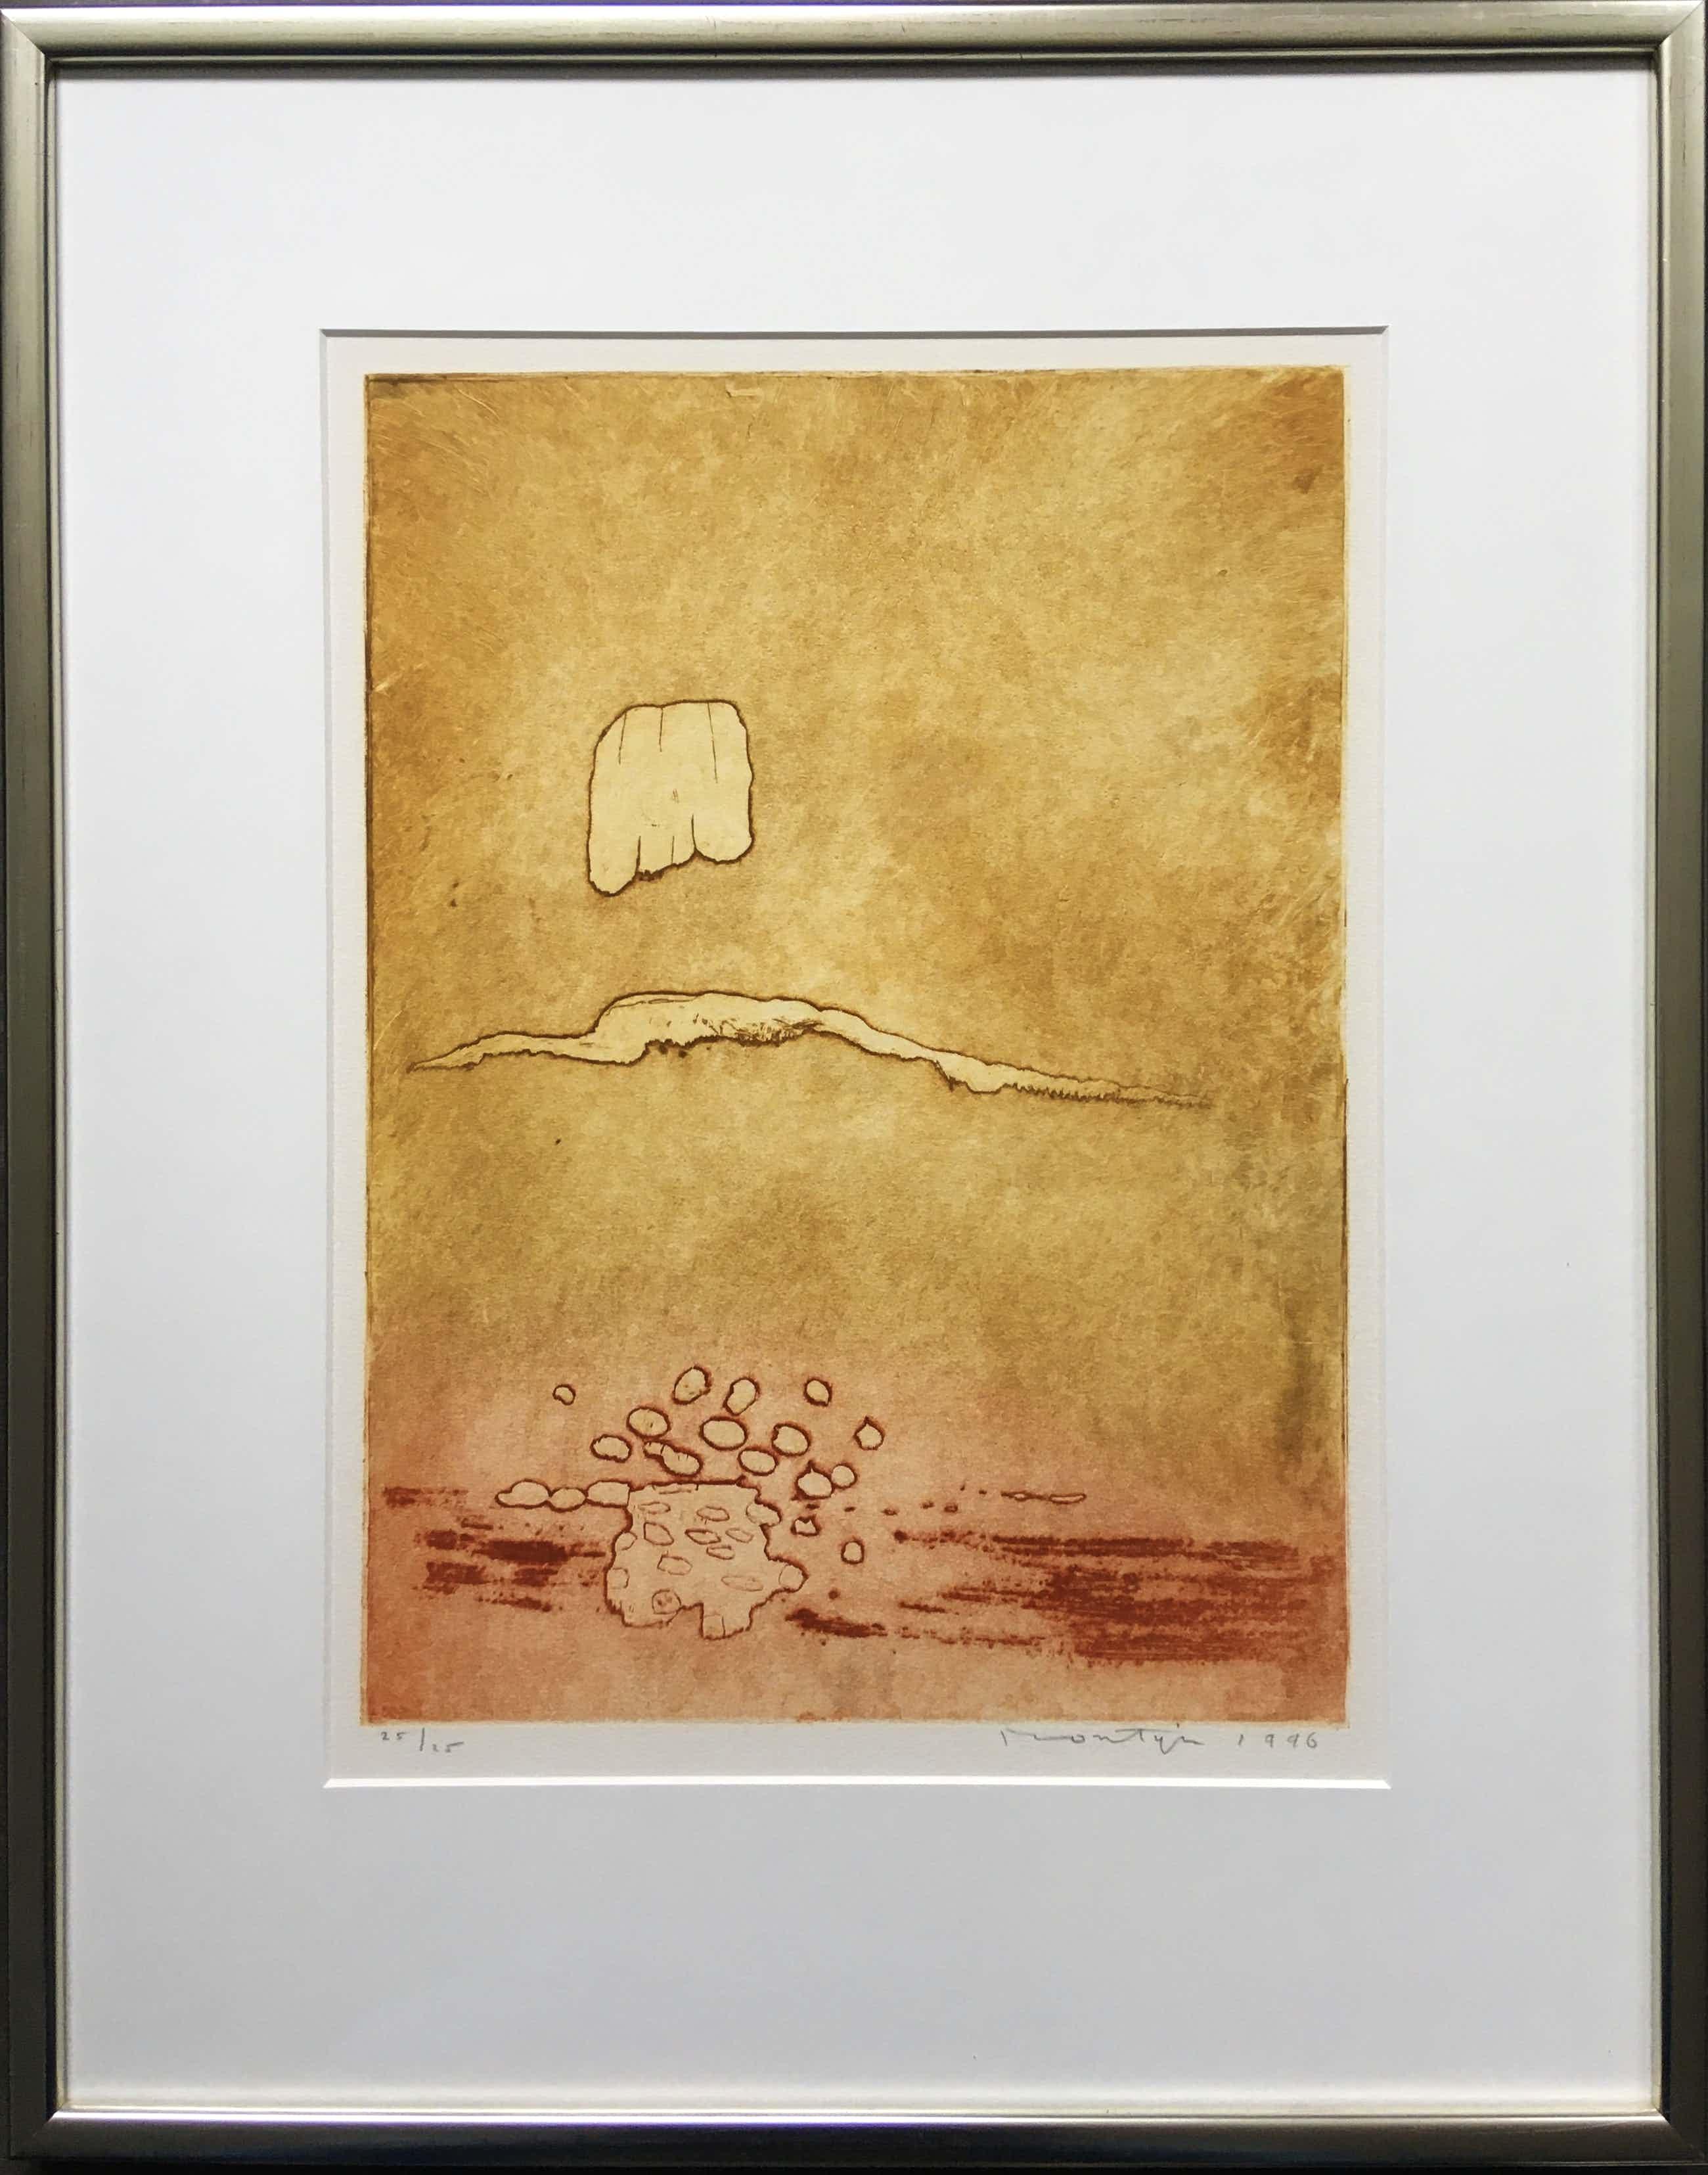 Jan Montyn - kleurenets - 1996 - oplage 25 - ingelijst kopen? Bied vanaf 135!